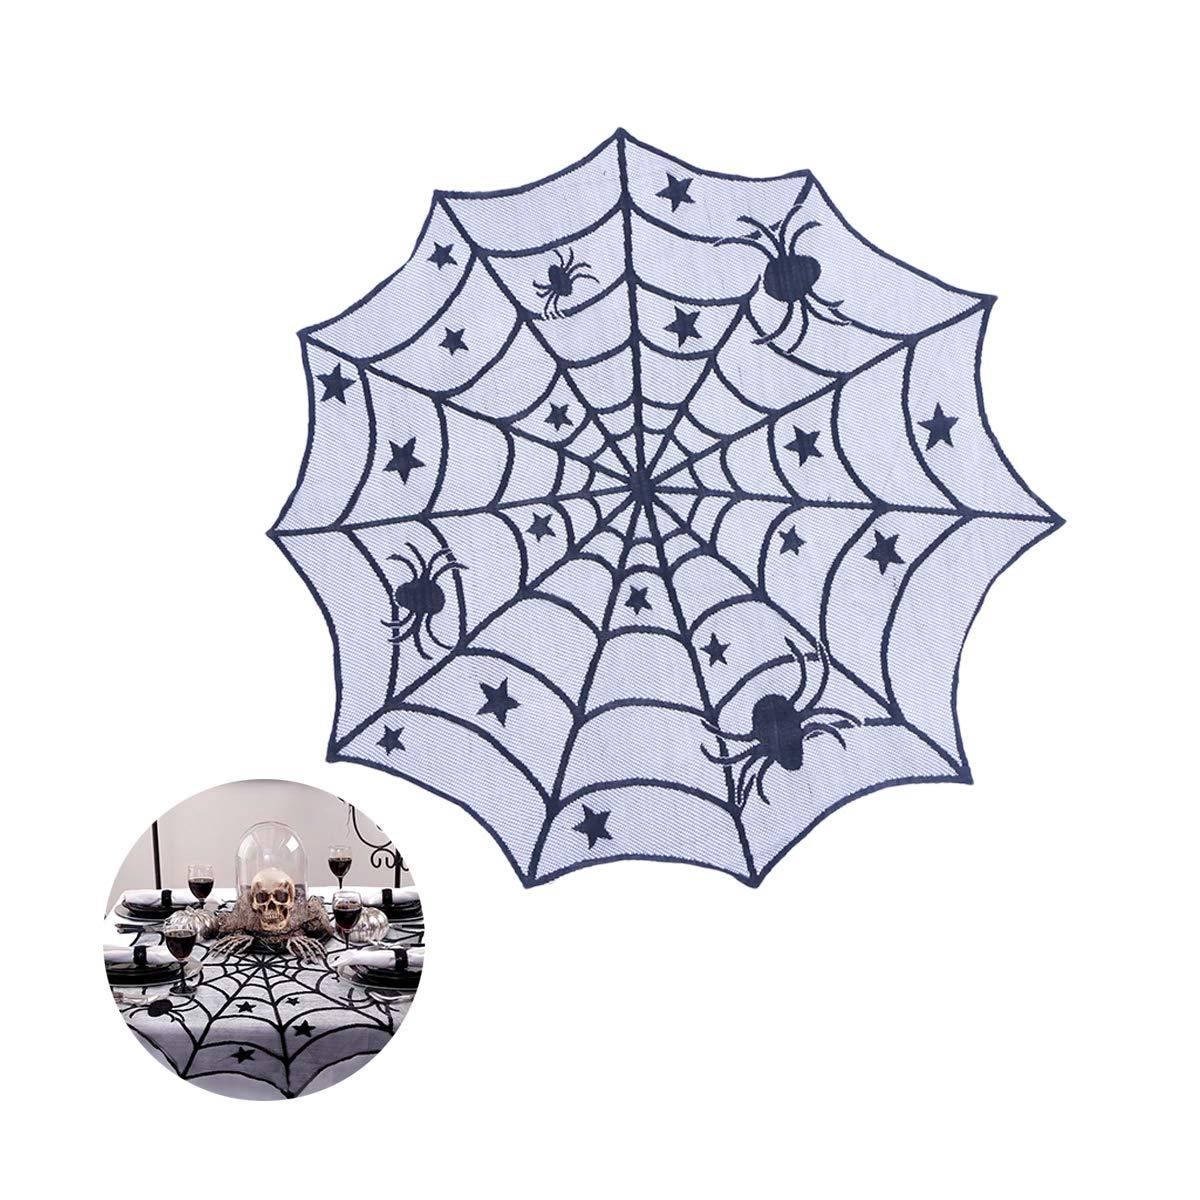 BESTOYARD Table Ronde en Toiles d'araignée Topper Couvre Nappe de Toile d'araignée de Toile Décoration de Table d'halloween (Noir)